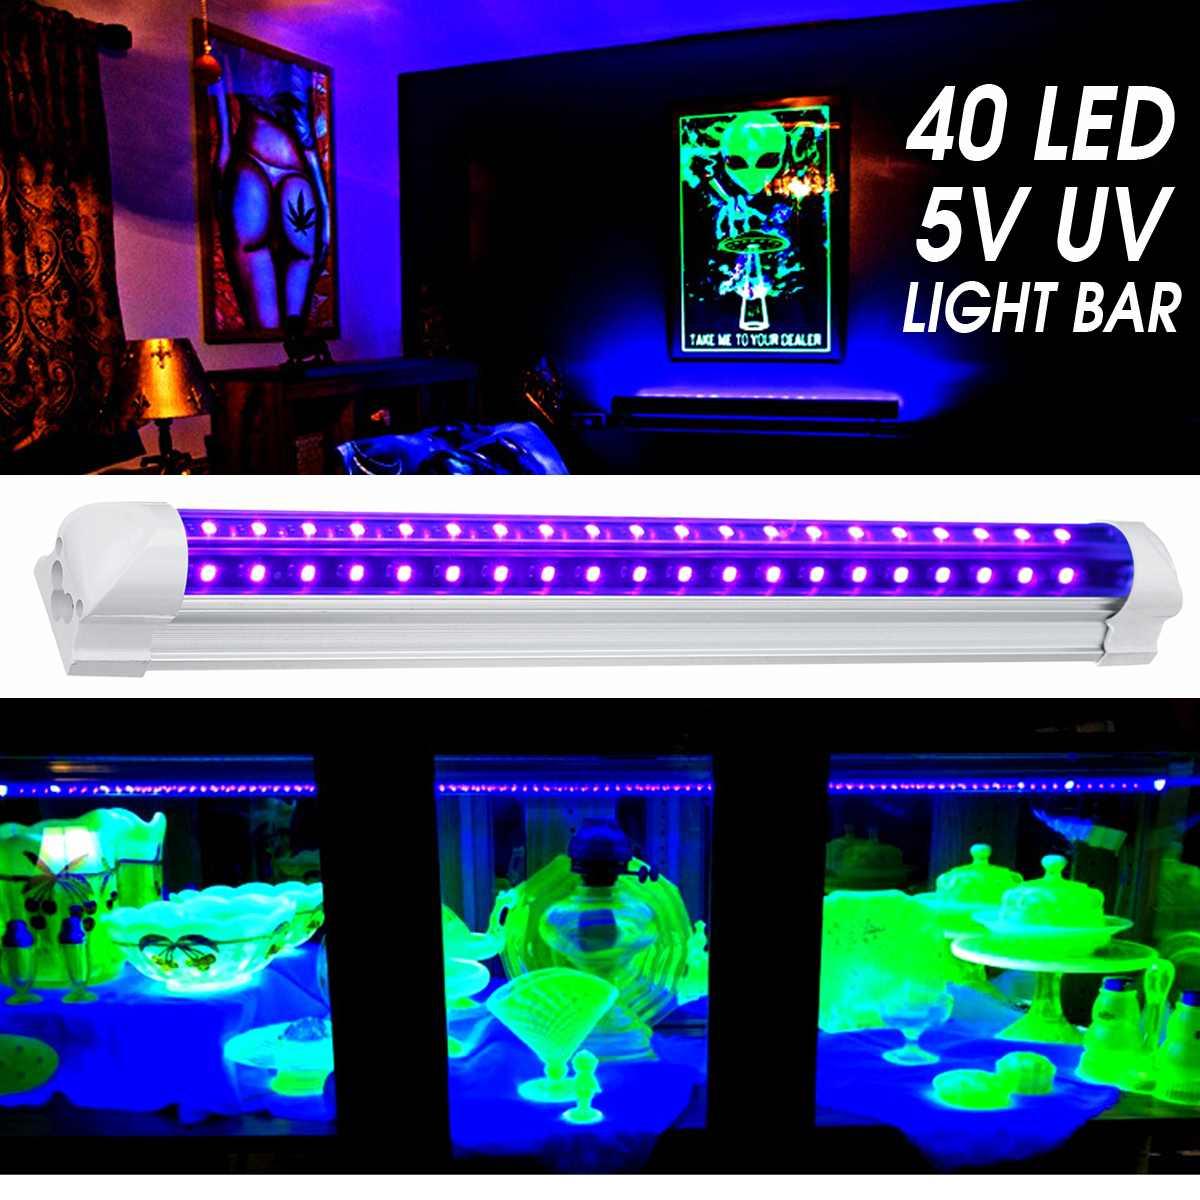 Smuxi 40 LEDs UV Ultraviolet Strip Light Bar UV Blacklight DJ Party Club Effect Light Fixture Stage Decor Disco Stage Lamp